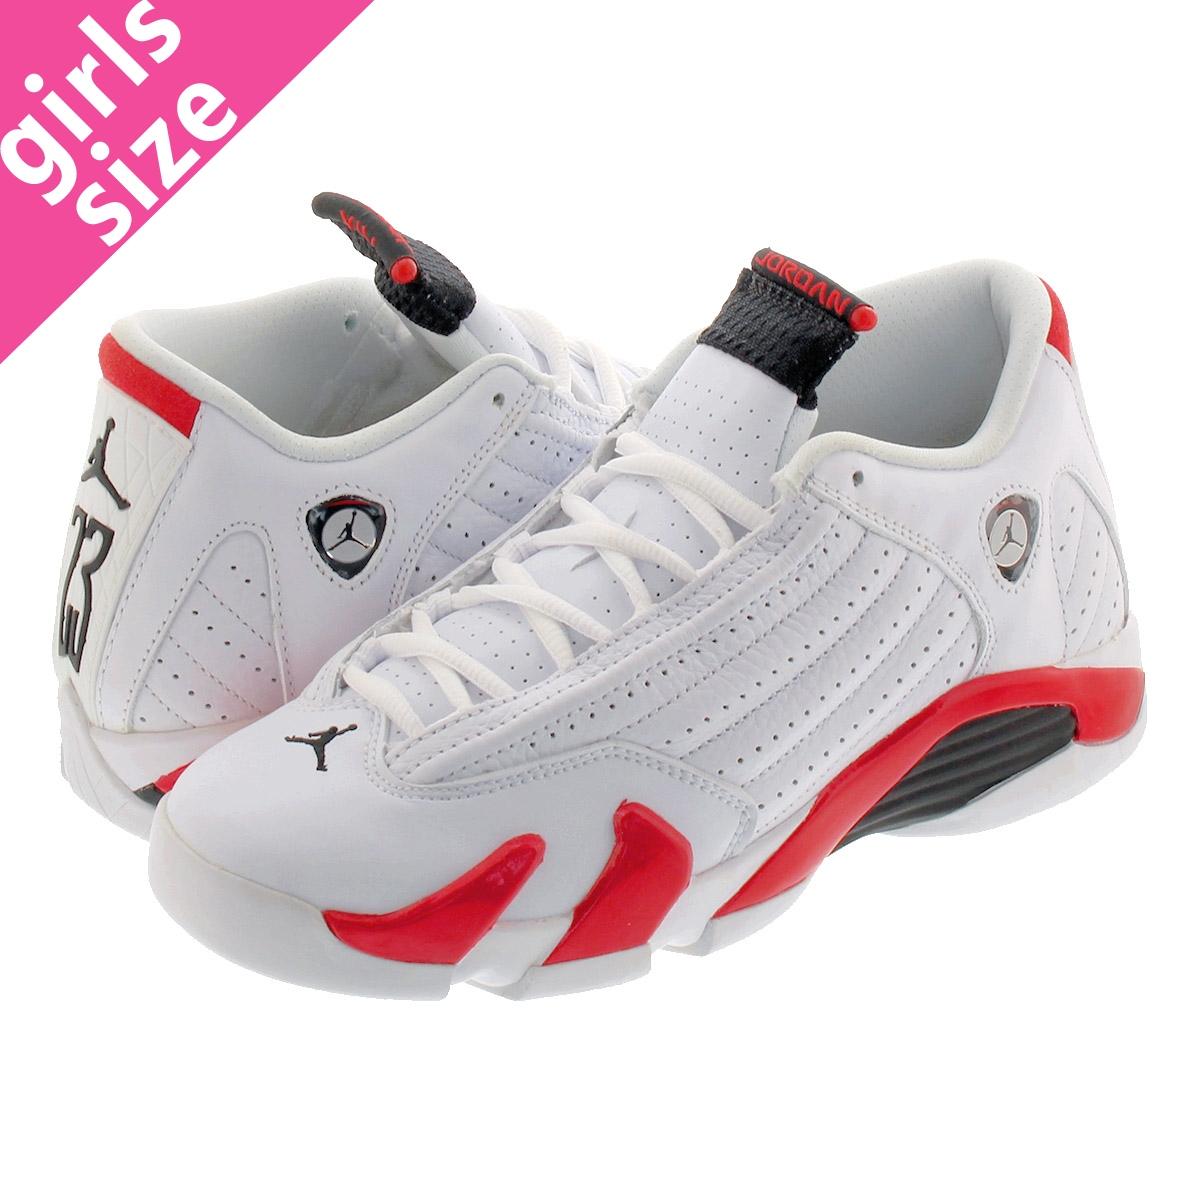 info for 1584b 05368 NIKE AIR JORDAN 14 RETRO BG Nike Air Jordan 14 nostalgic BG WHITE BLACK VARSITY  RED MTLC SILVER 487,524-100